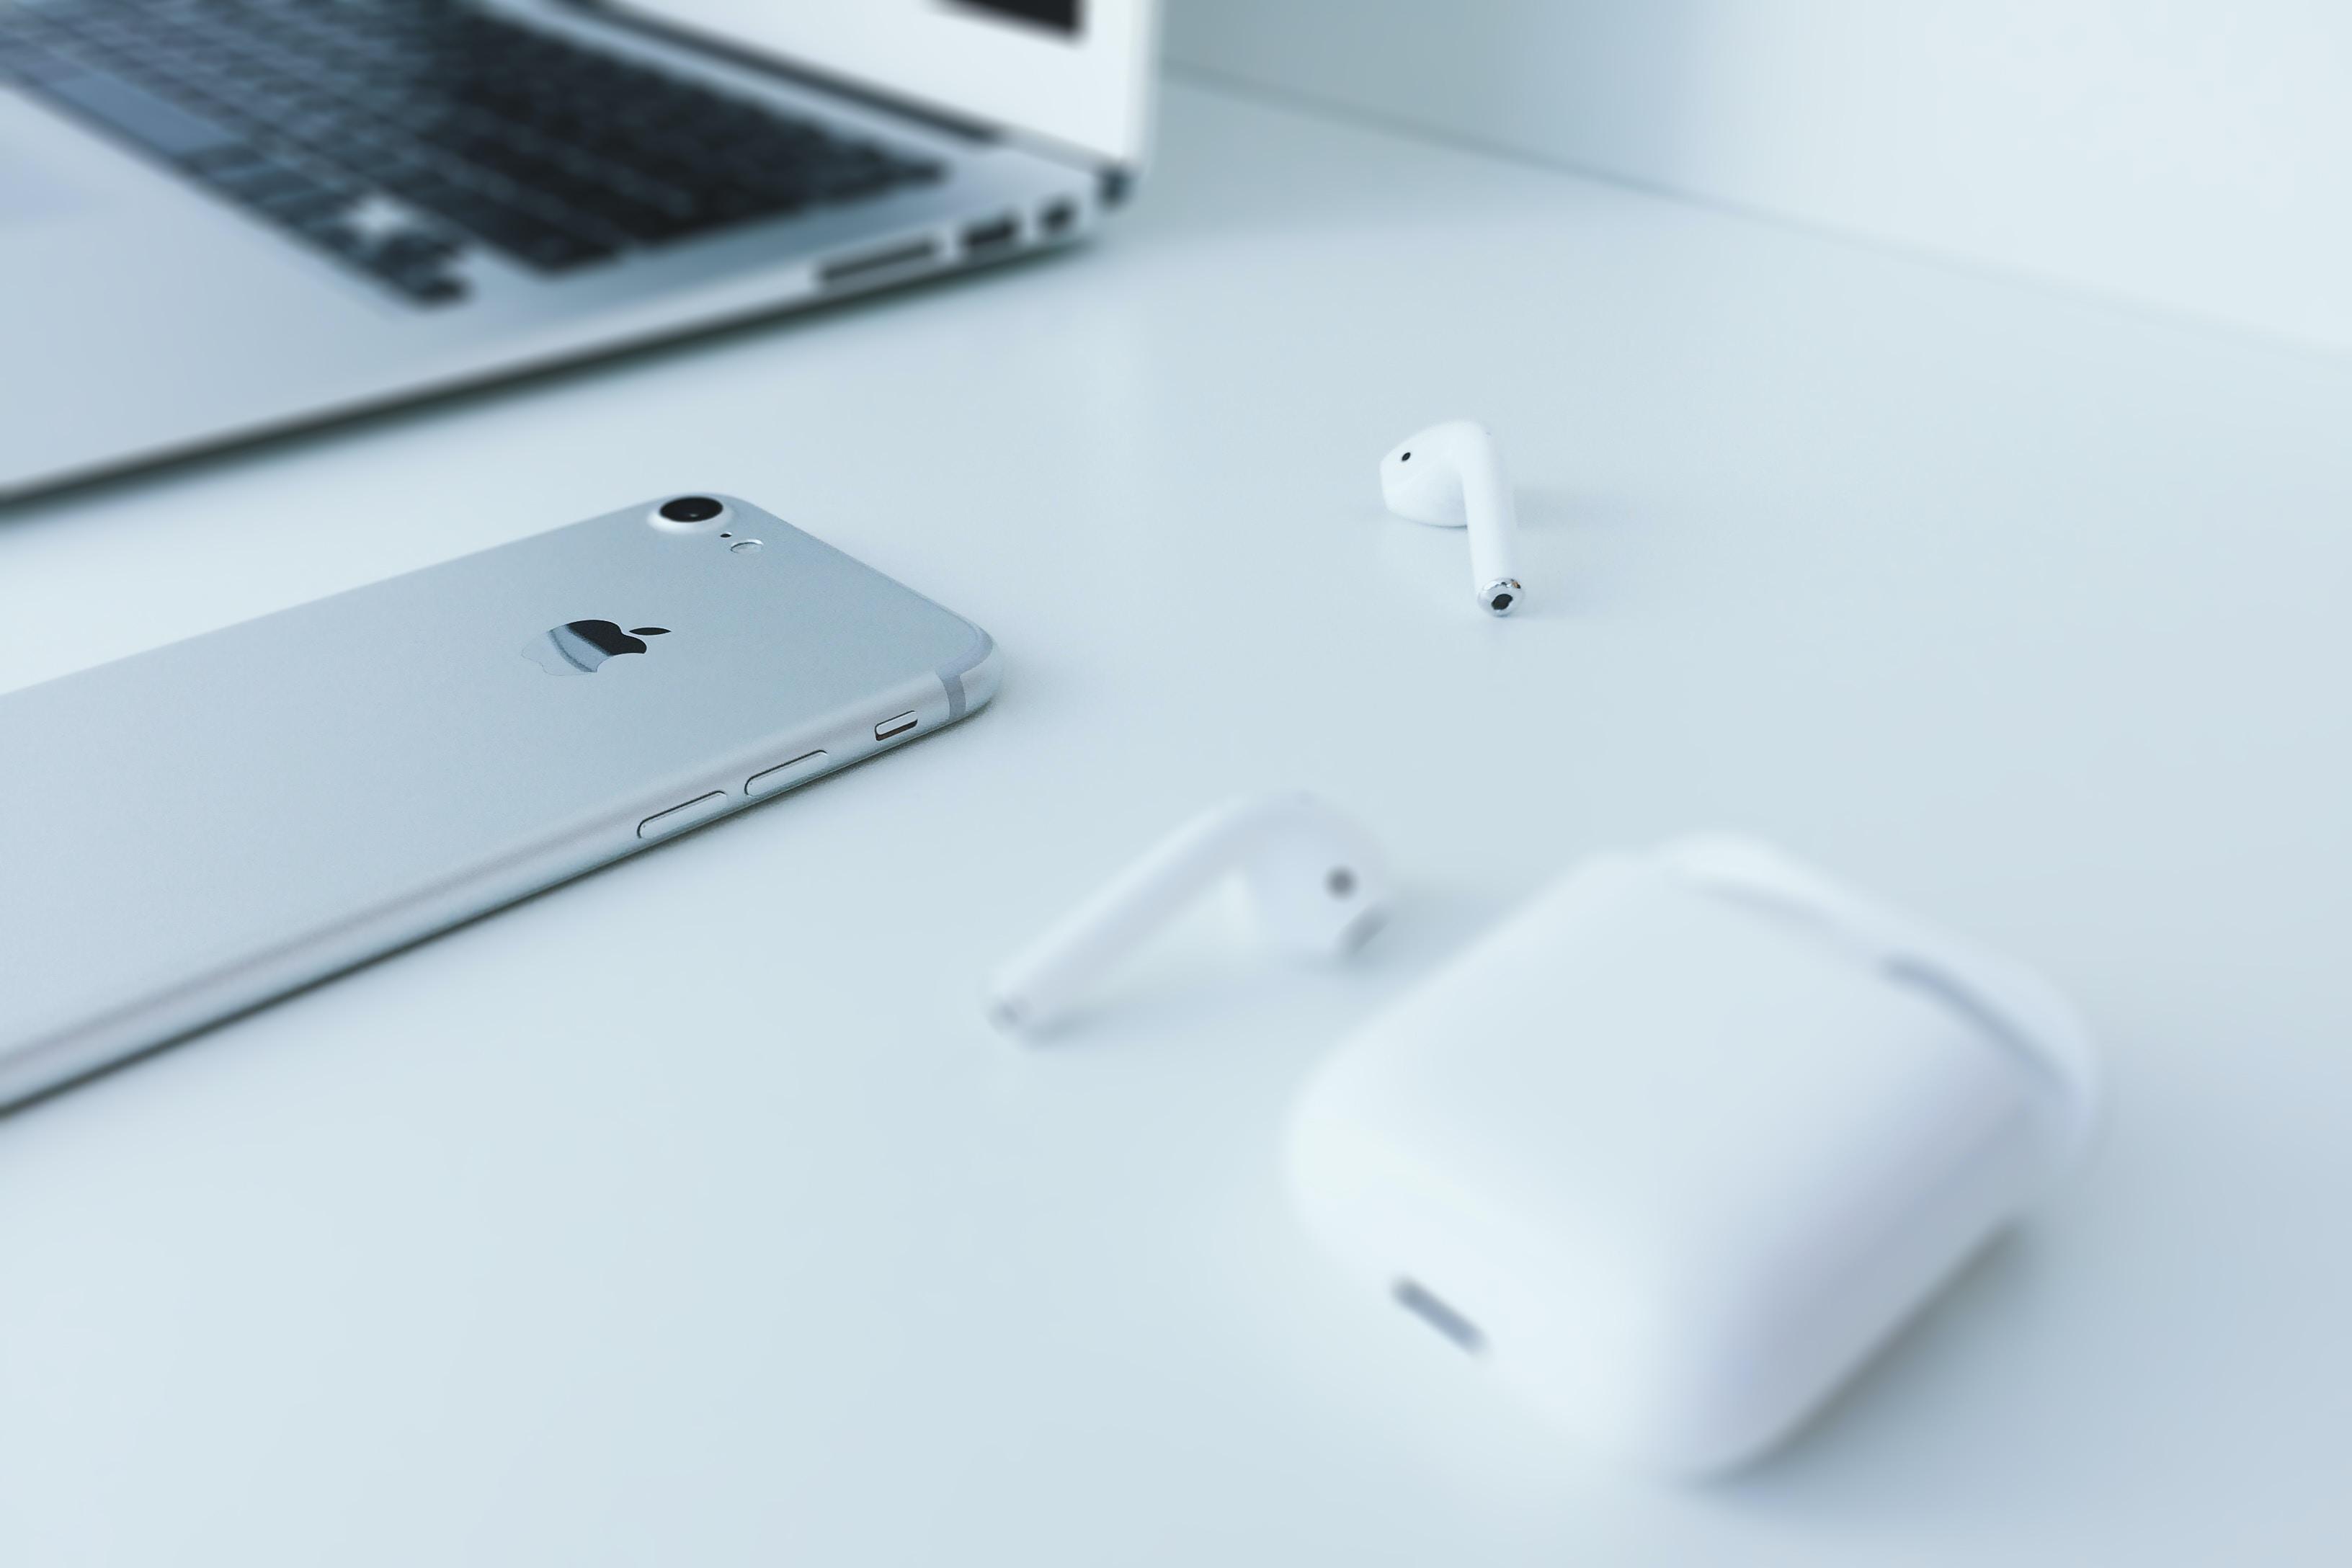 A Macbook computer, Apple wireless earbuds, and an iPhone cellphone in Essen, Nadrenia Północna-Westfalia, Niemcy